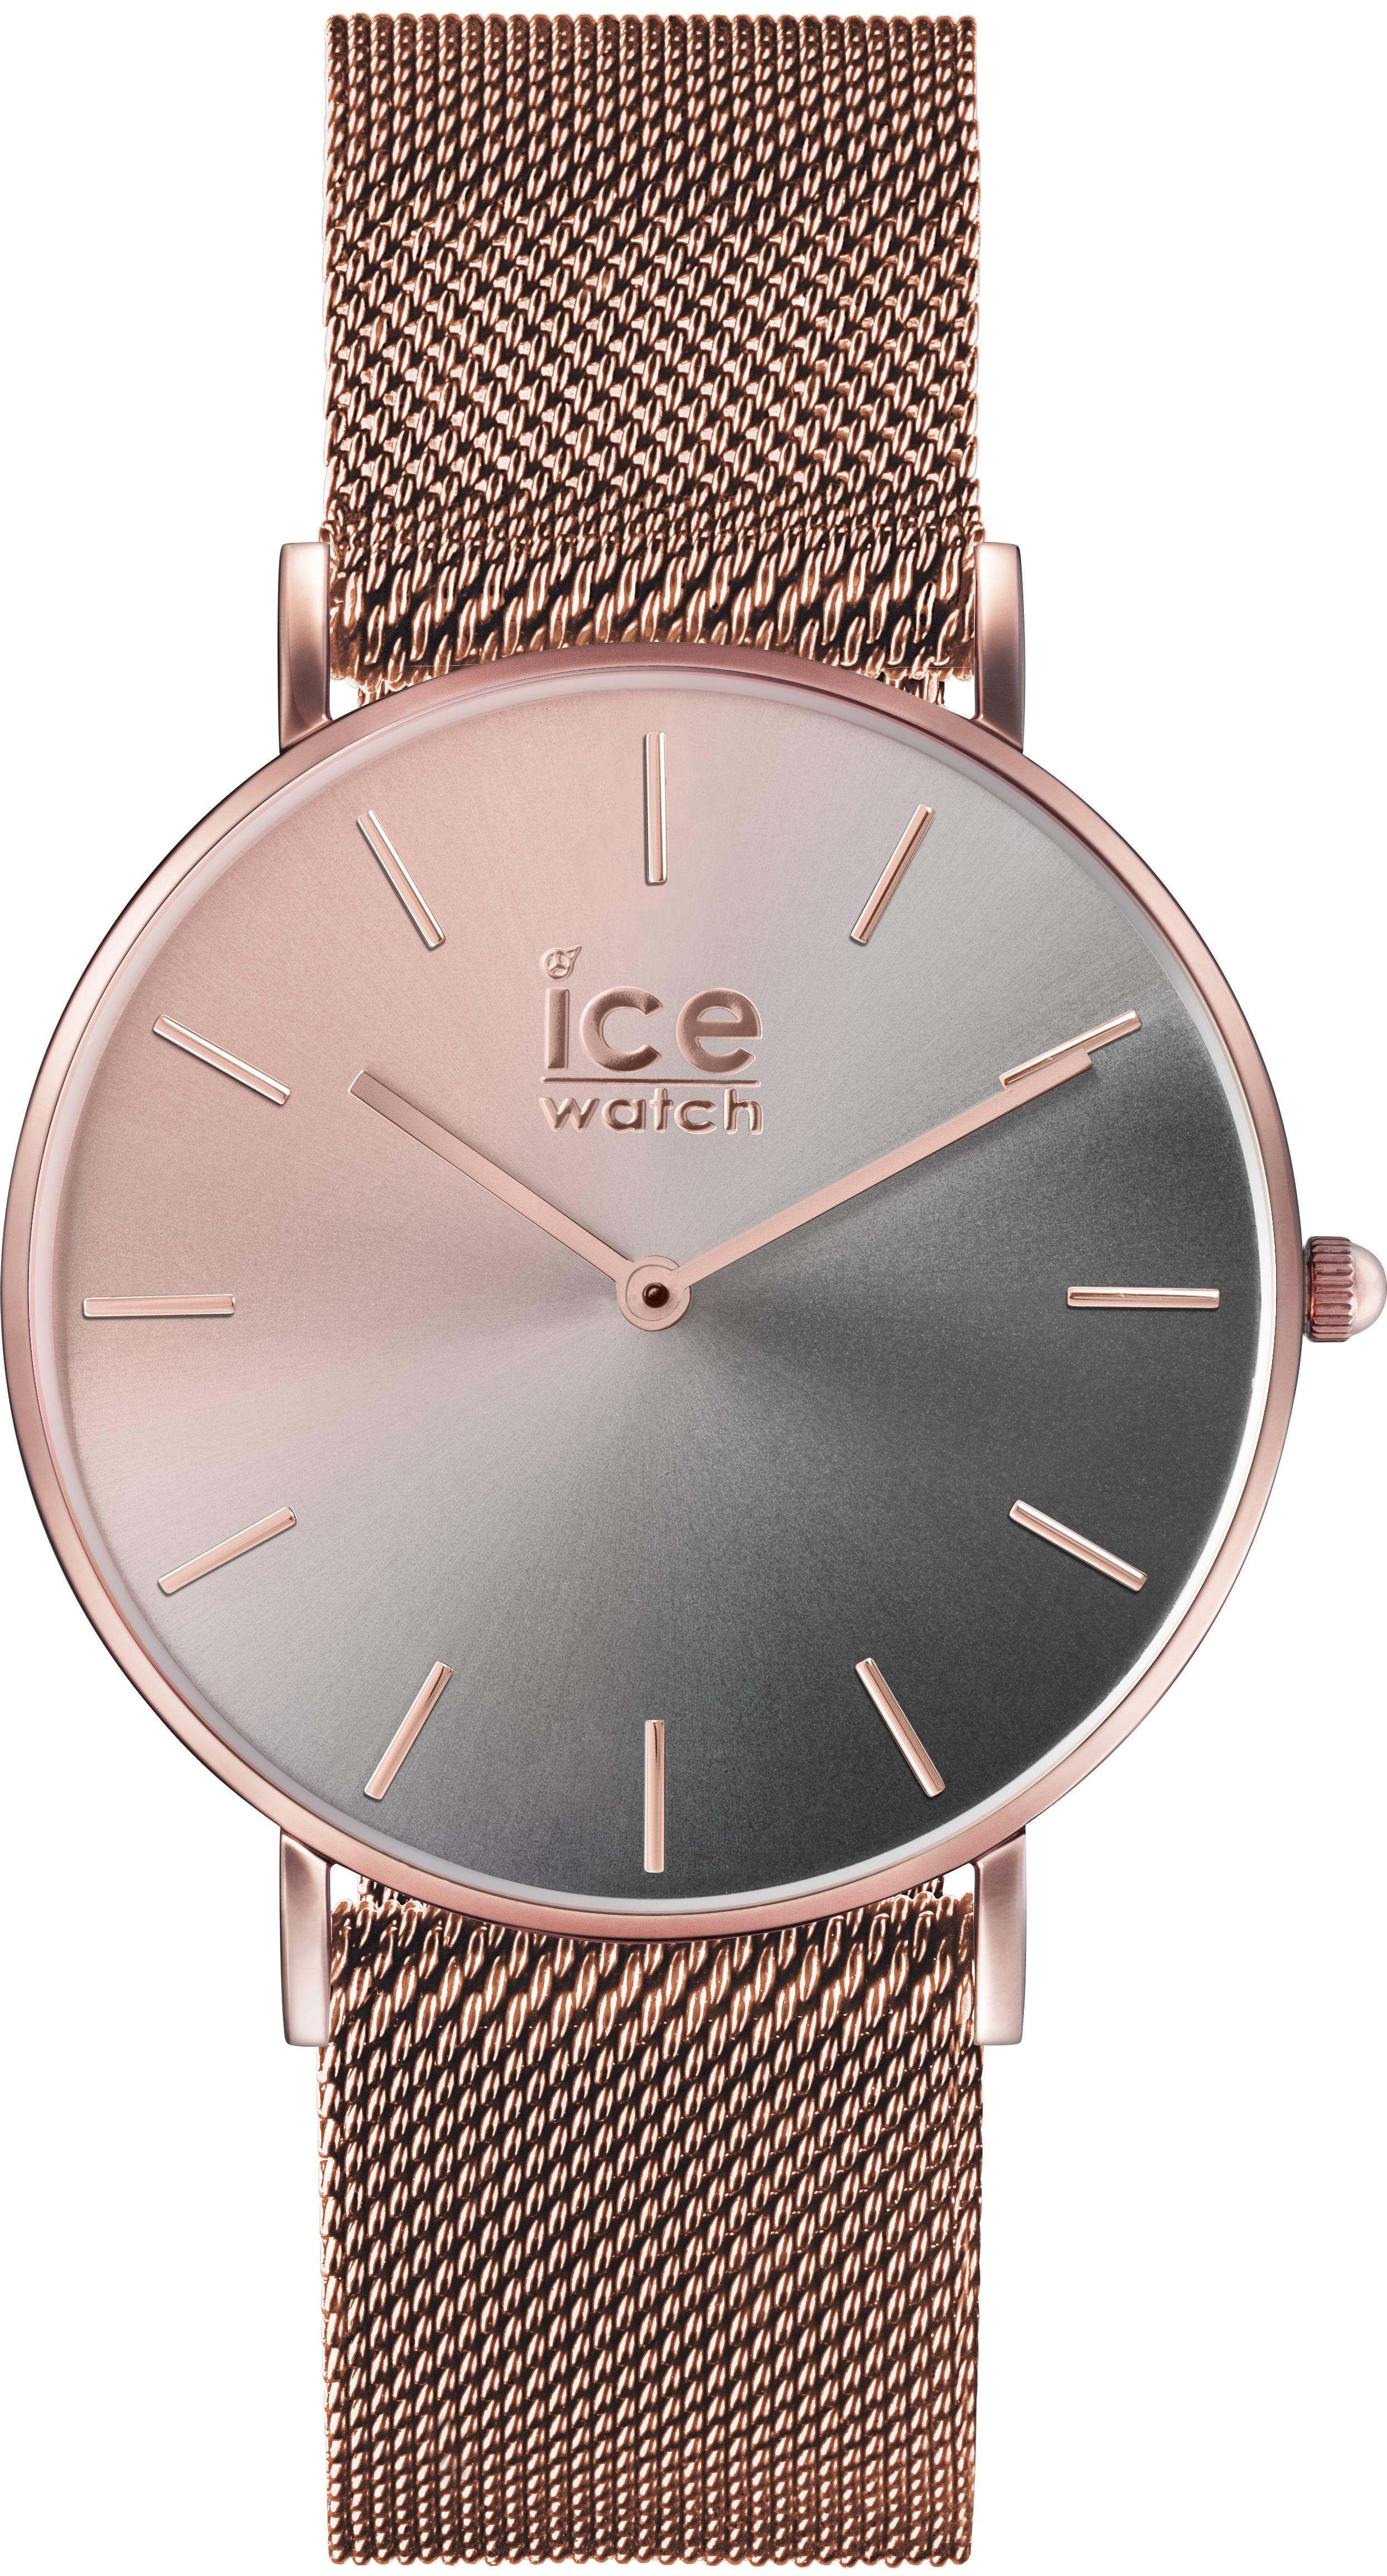 016024 ICE WATCH Ice city milanese óra - TUTU Óraszalon Westend 854c33d8be